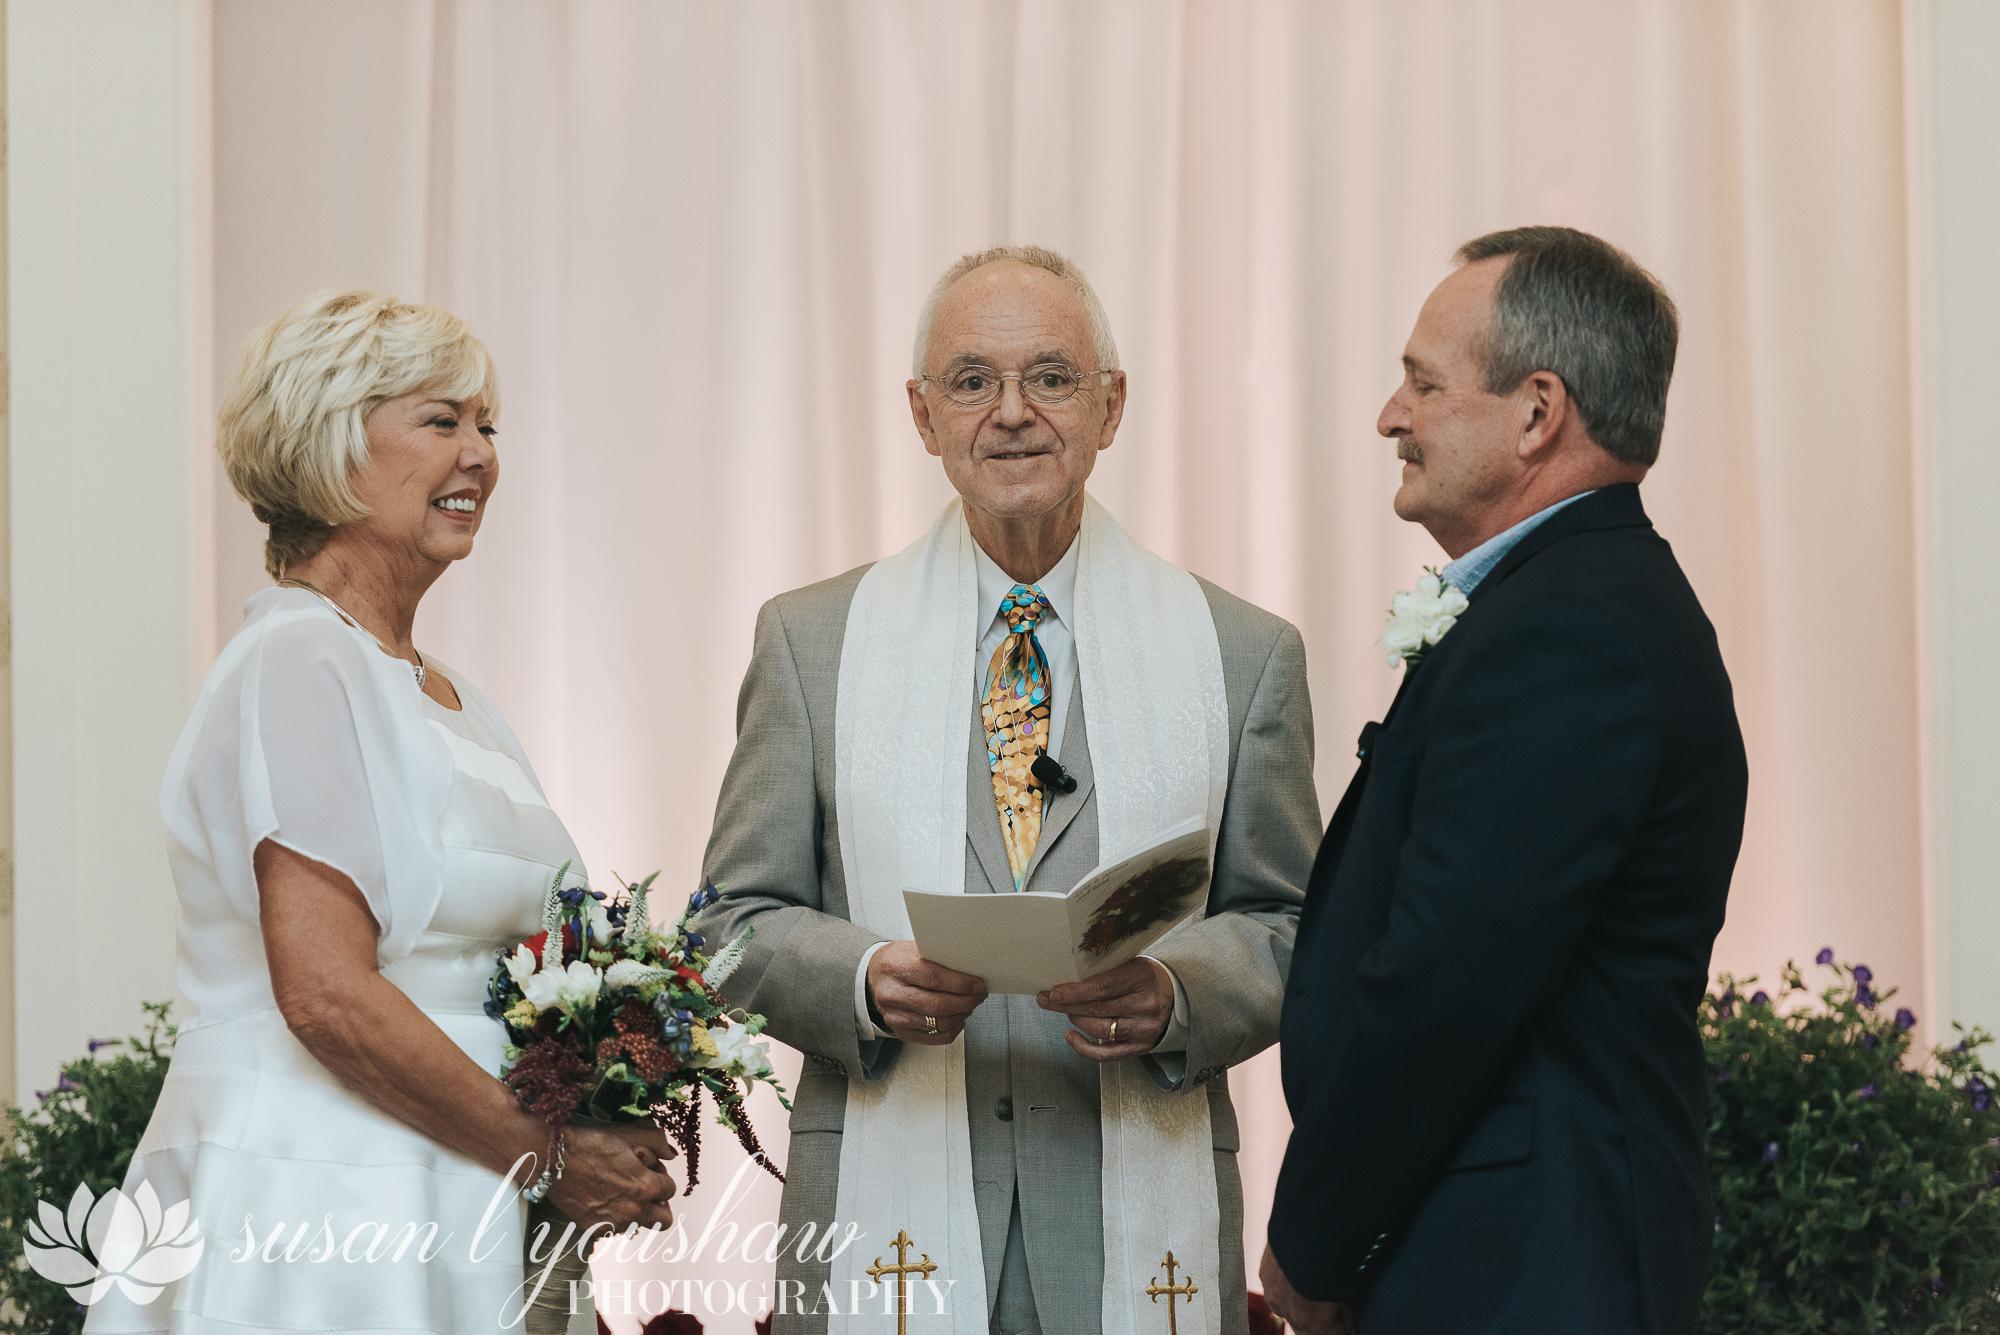 BLOG Carolyn Adams and Jim McCune 07-04-2018 SLY Photography-70.jpg